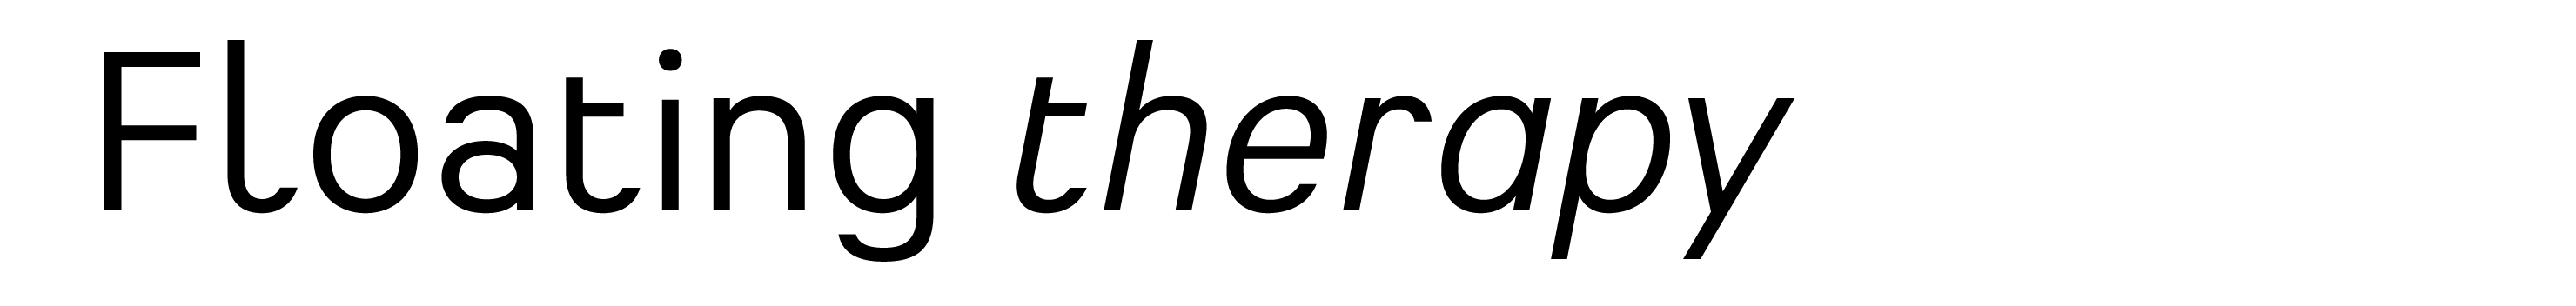 Typeface Heimat Sans D09 Atlas Font Foundry